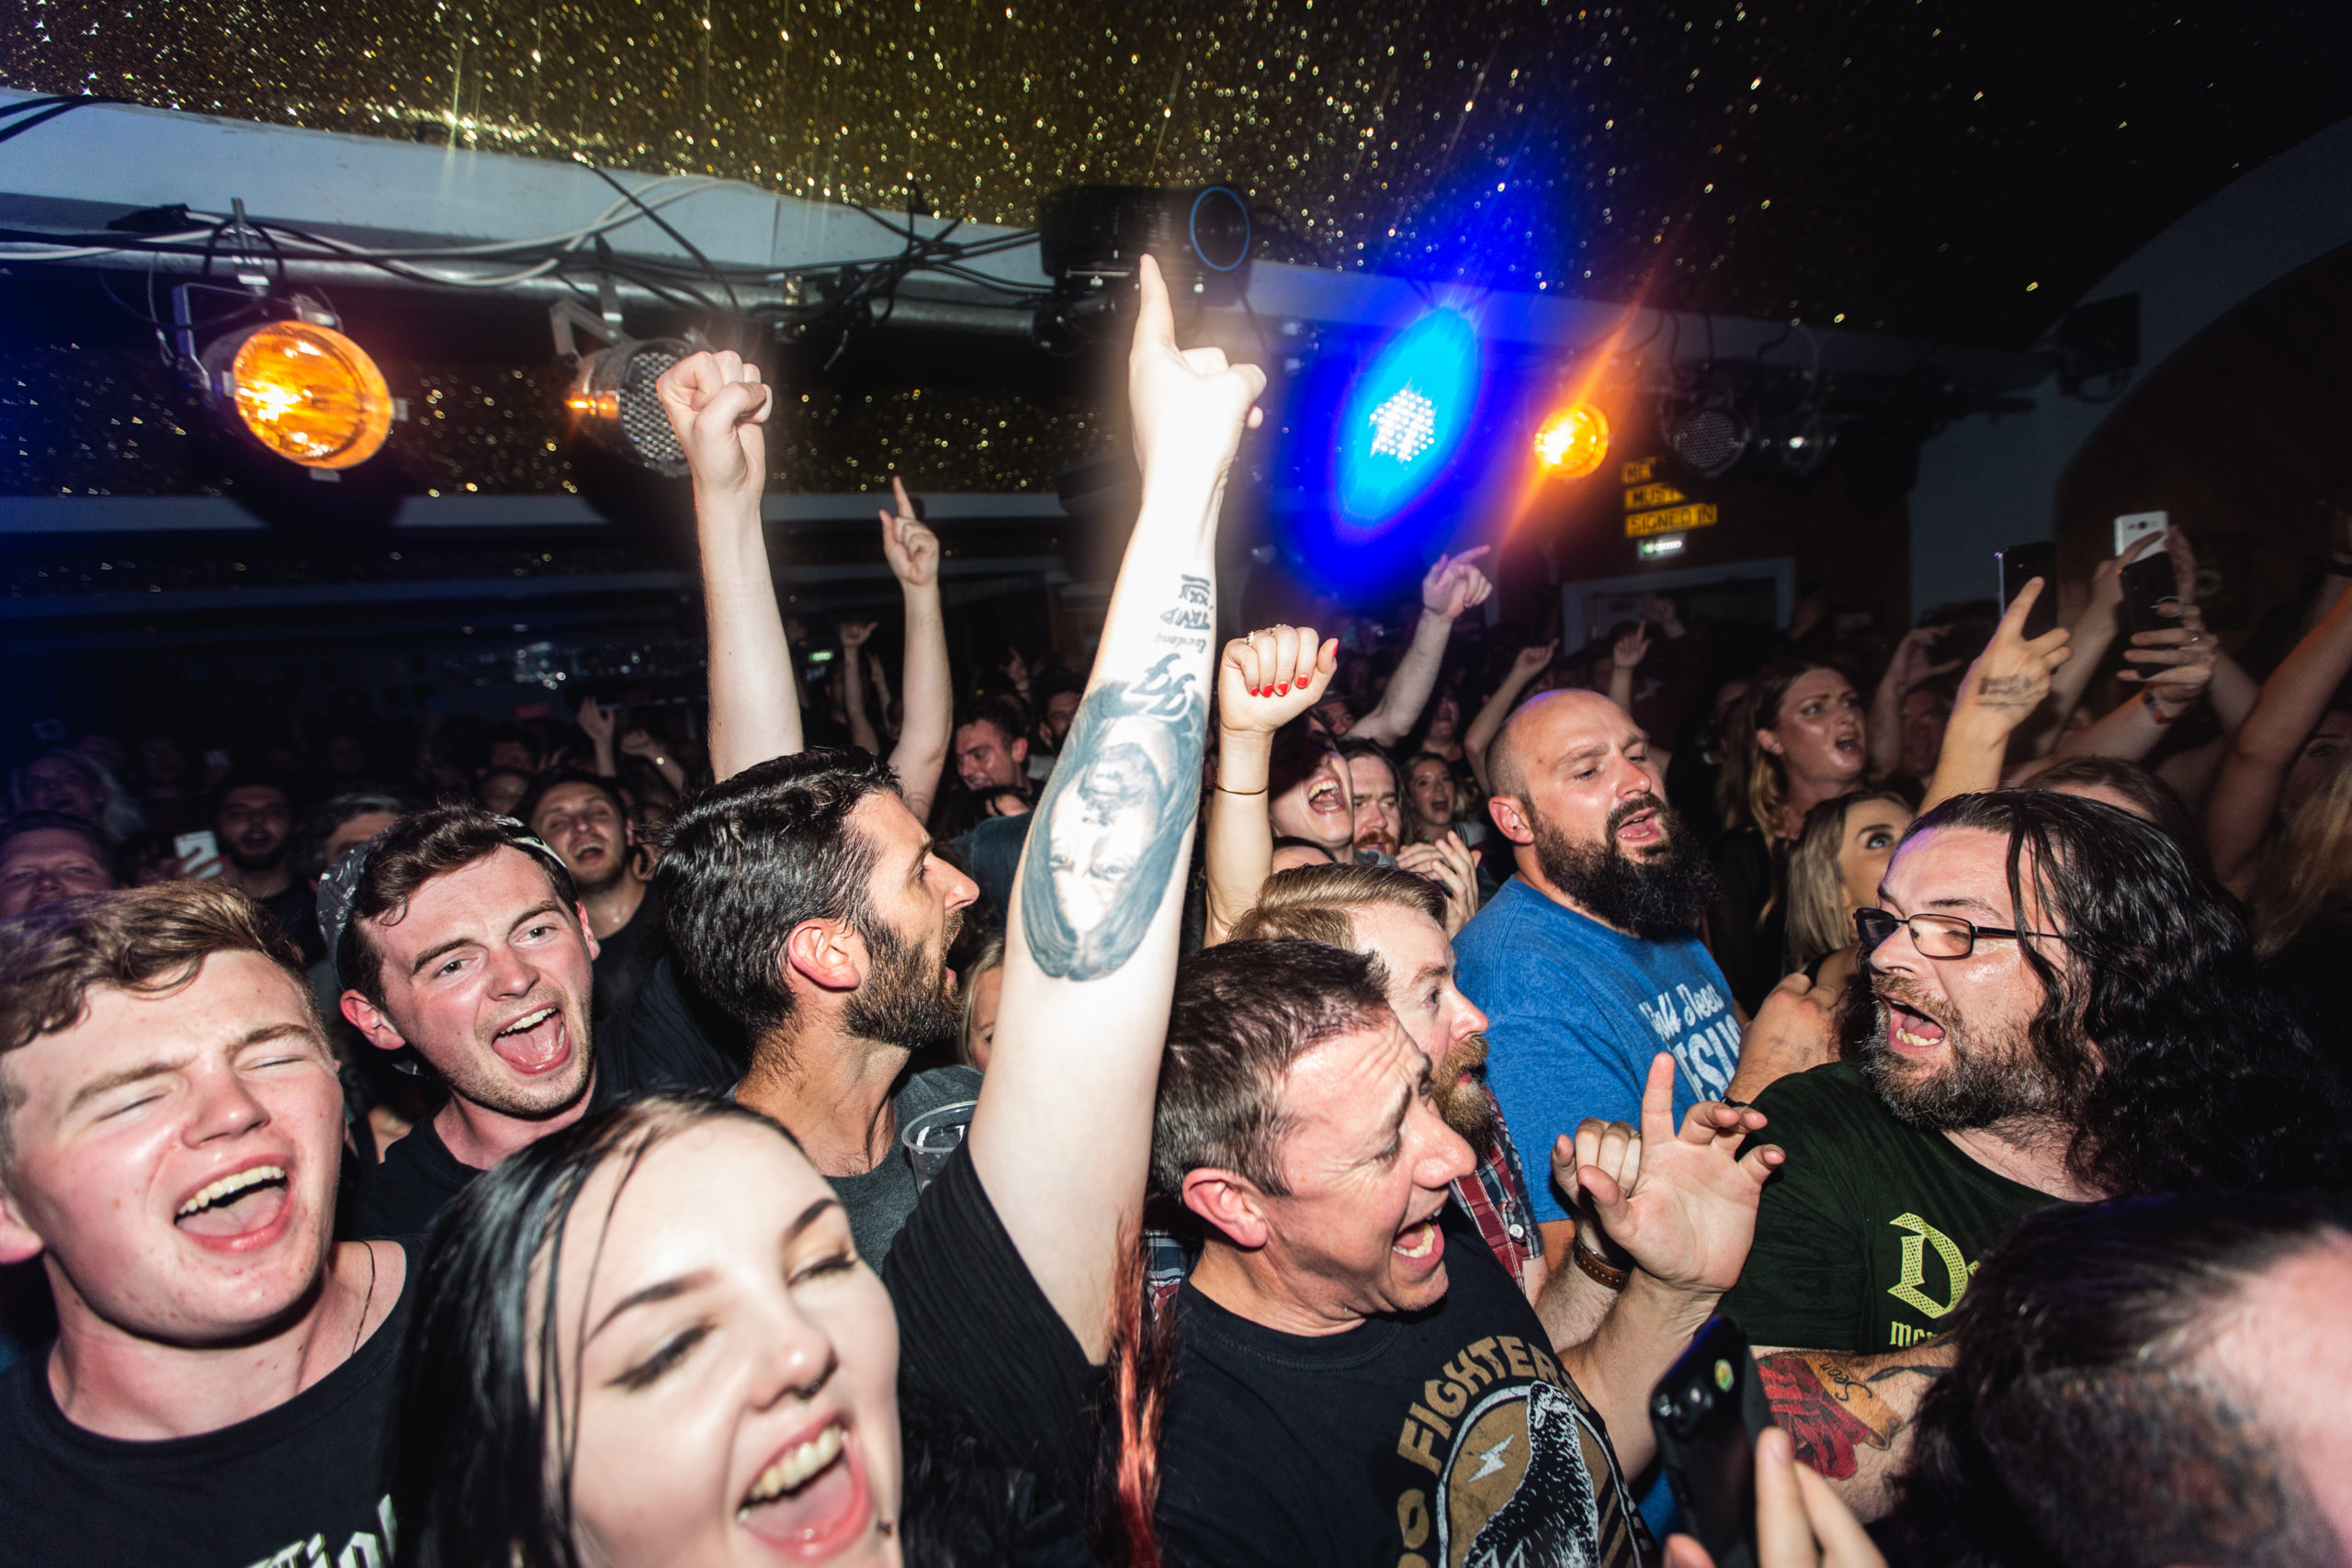 Club NME relaunch